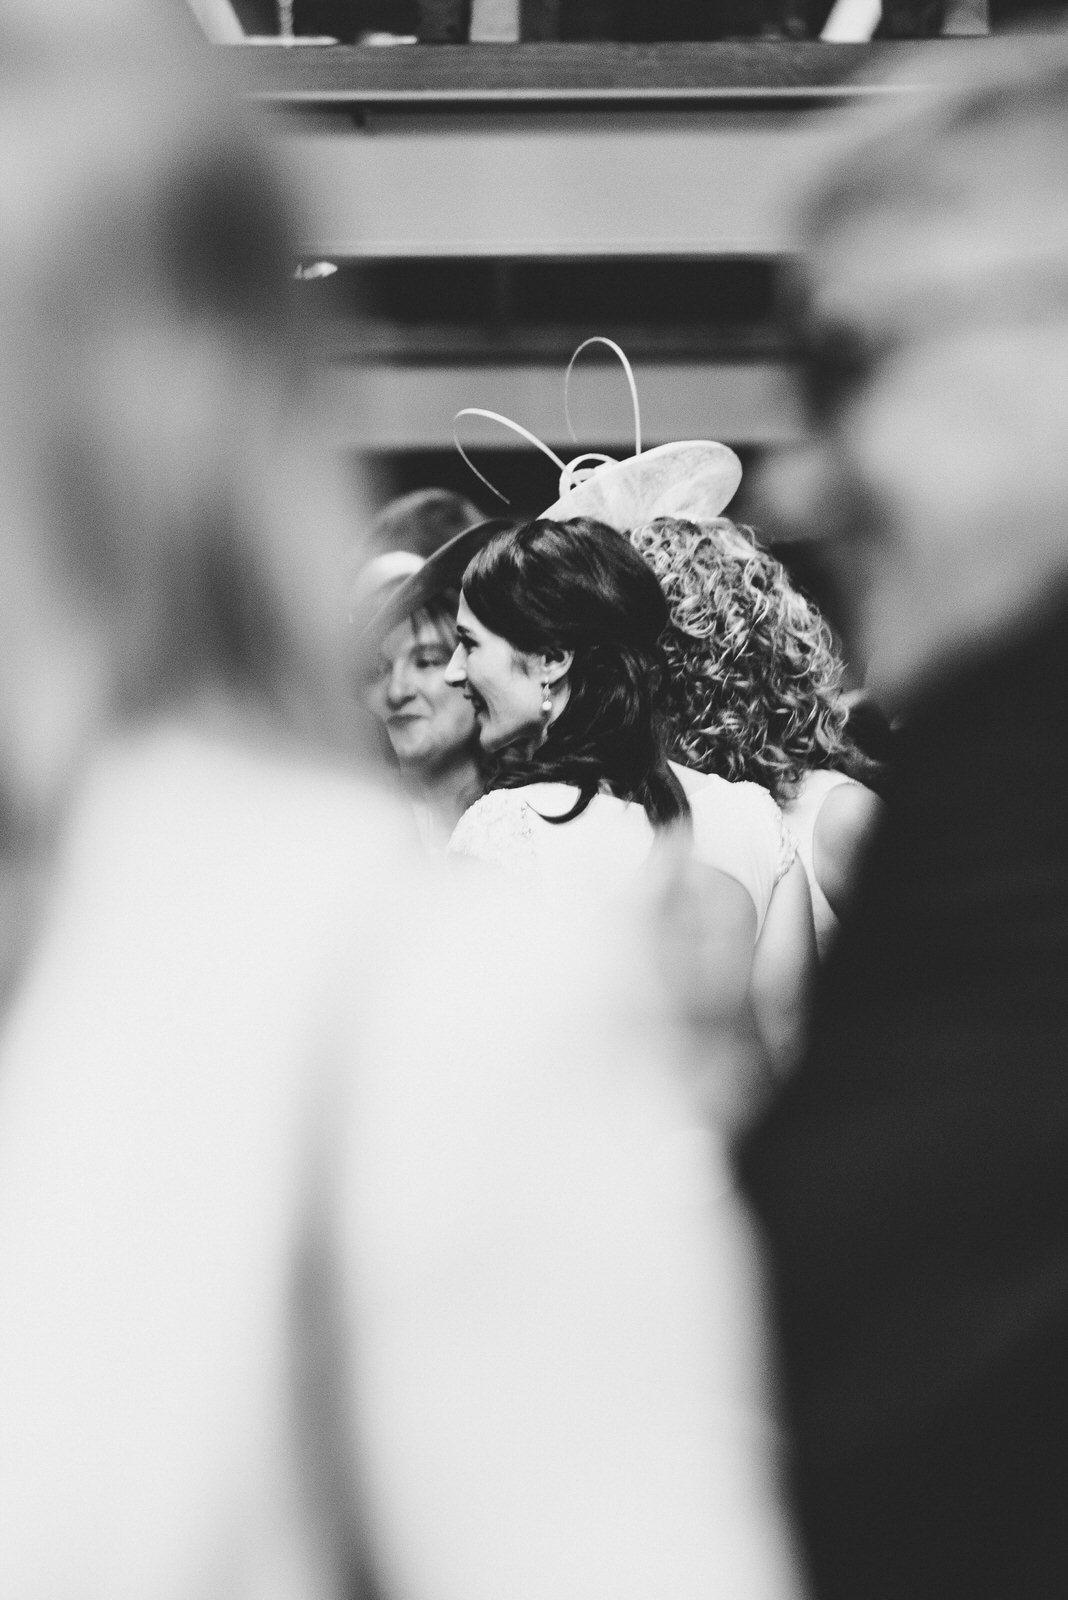 031-GUARDSWELL-FARM-WEDDING-ALTERNATIVE-SCOTTISH-WEDDING-PHOTOGRAPHER-SCOTTISH-WEDDING-DESTINATION-WEDDING-PHOTOGRAPHER.JPG